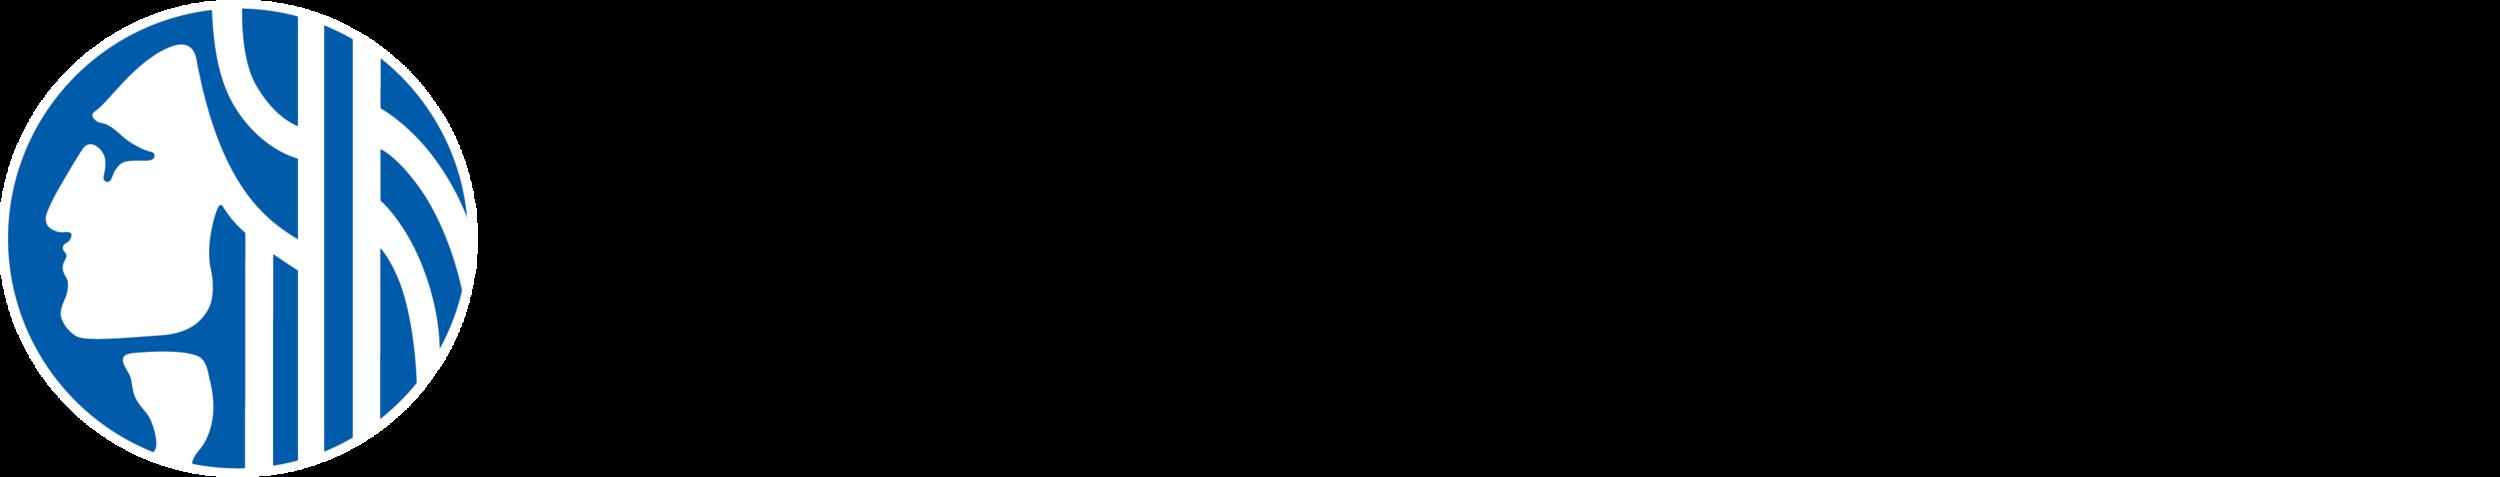 CityofSeattle-logo_horizontal_blue-black_print.png